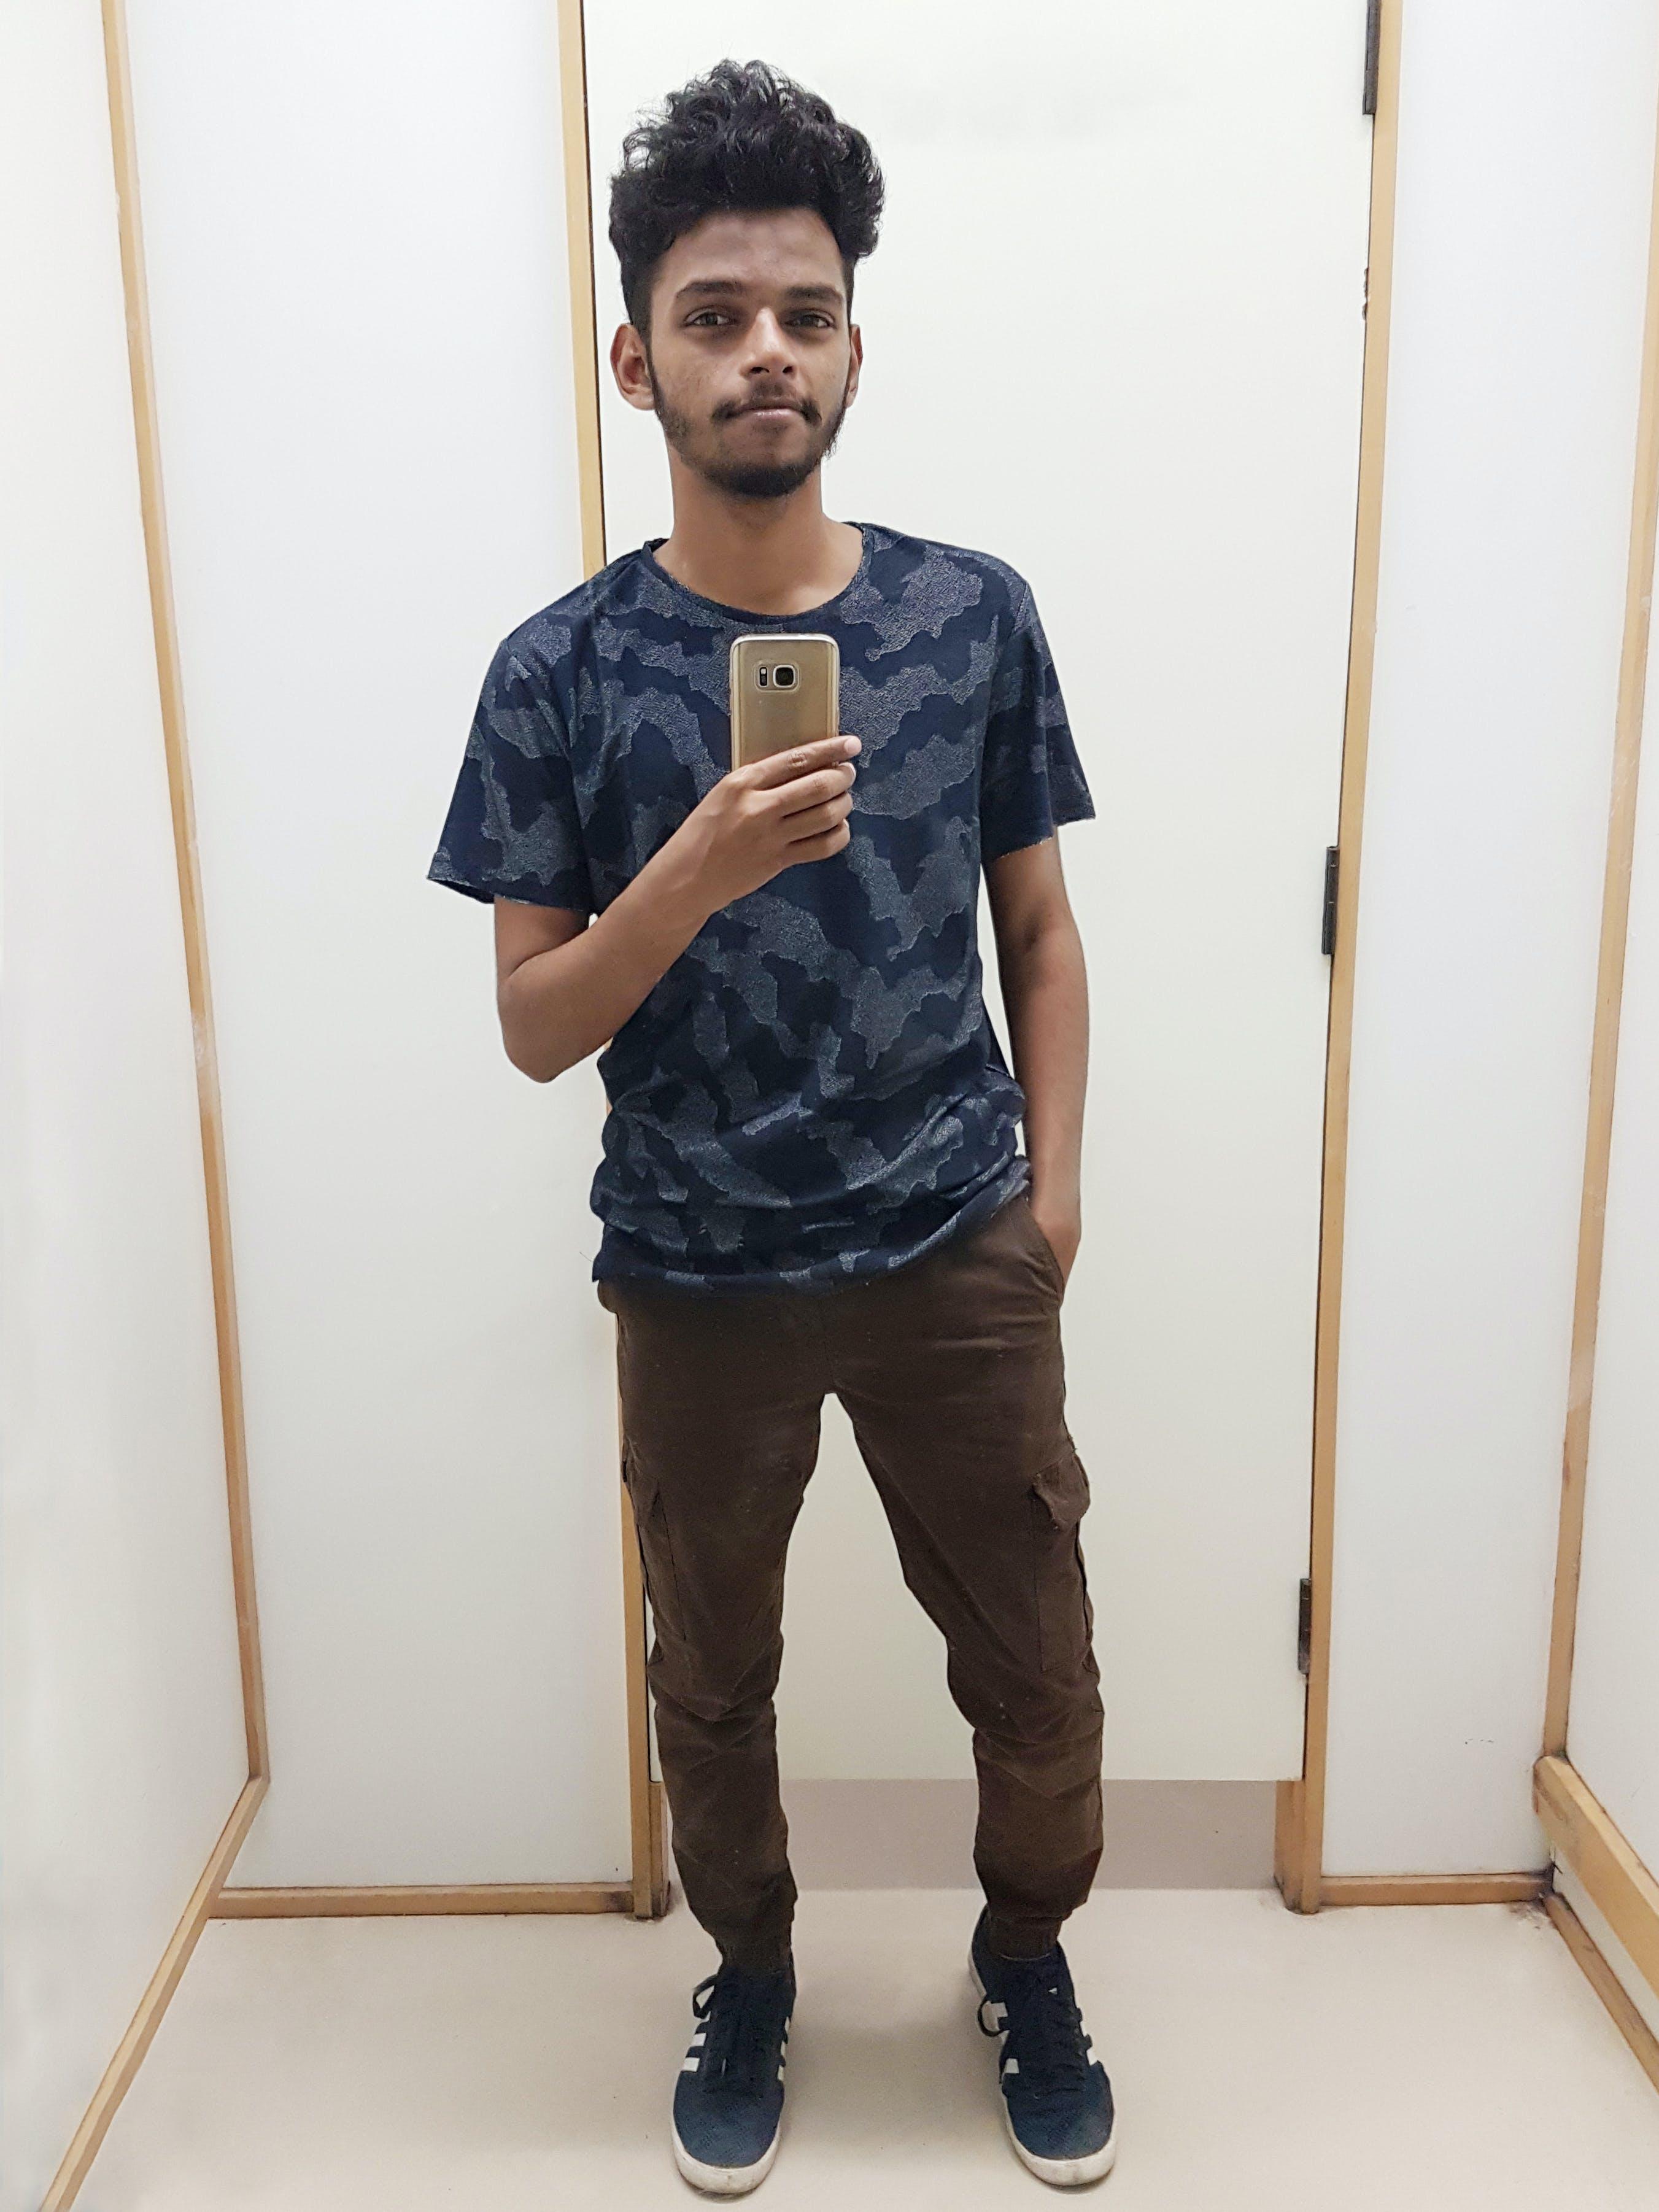 Free stock photo of indian boy, mirror, mirror image, selfie